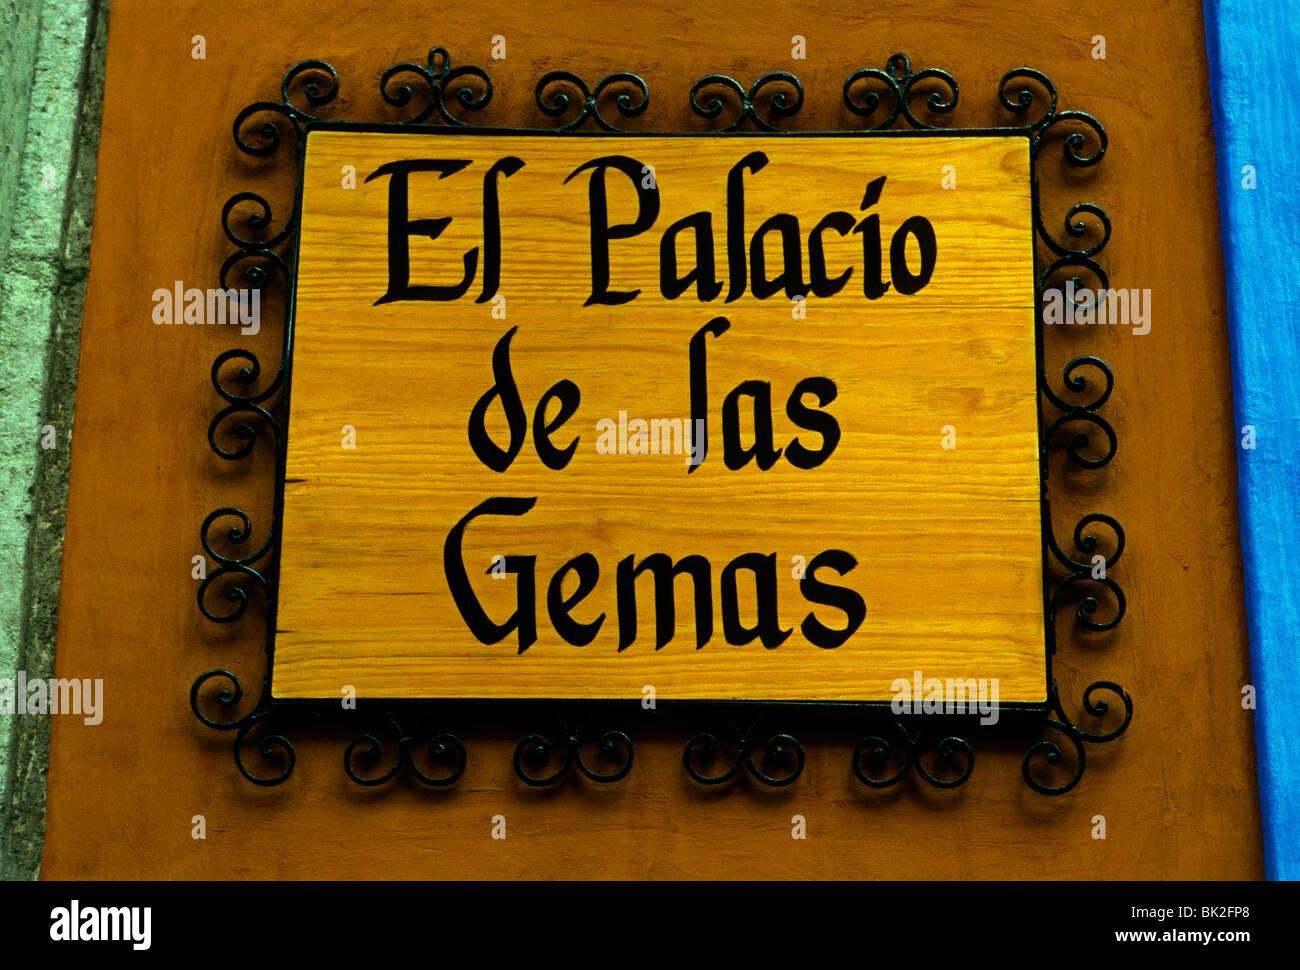 El Palacio de las Gemas, jewelry store, Calle Macedenio Alcala, Alcala Street, capital city, Oaxaca de Juarez, Oaxaca, Oaxaca State, Mexico Stock Photo